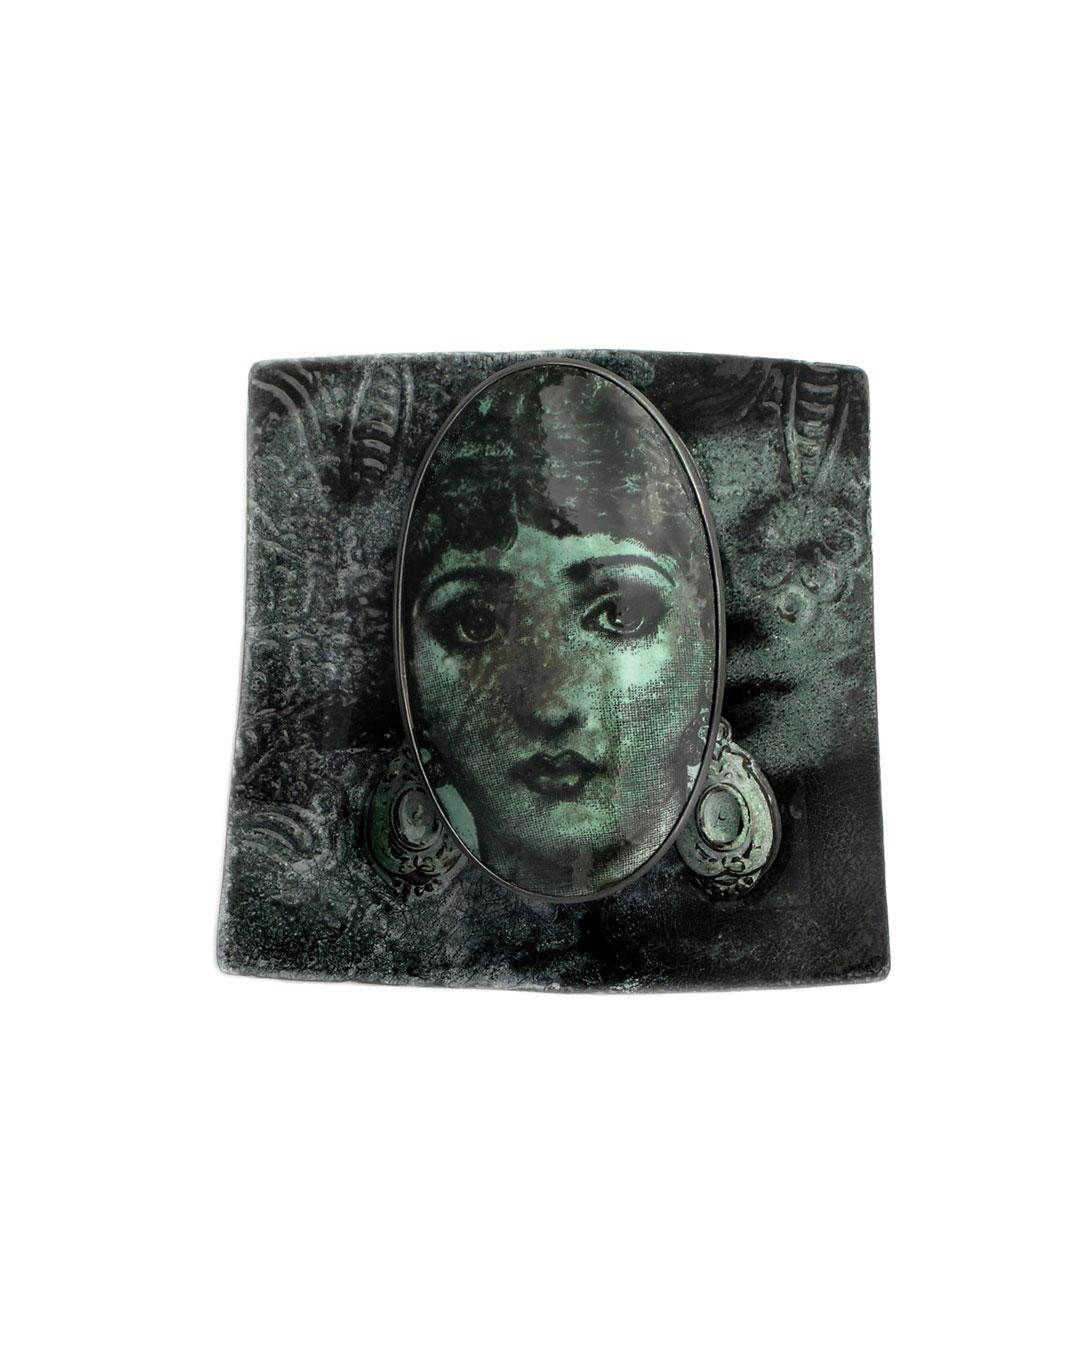 Vera Siemund, untitled, 2009, brooch; copper, silver, enamel, 85 x 75 x 20 mm, €1050